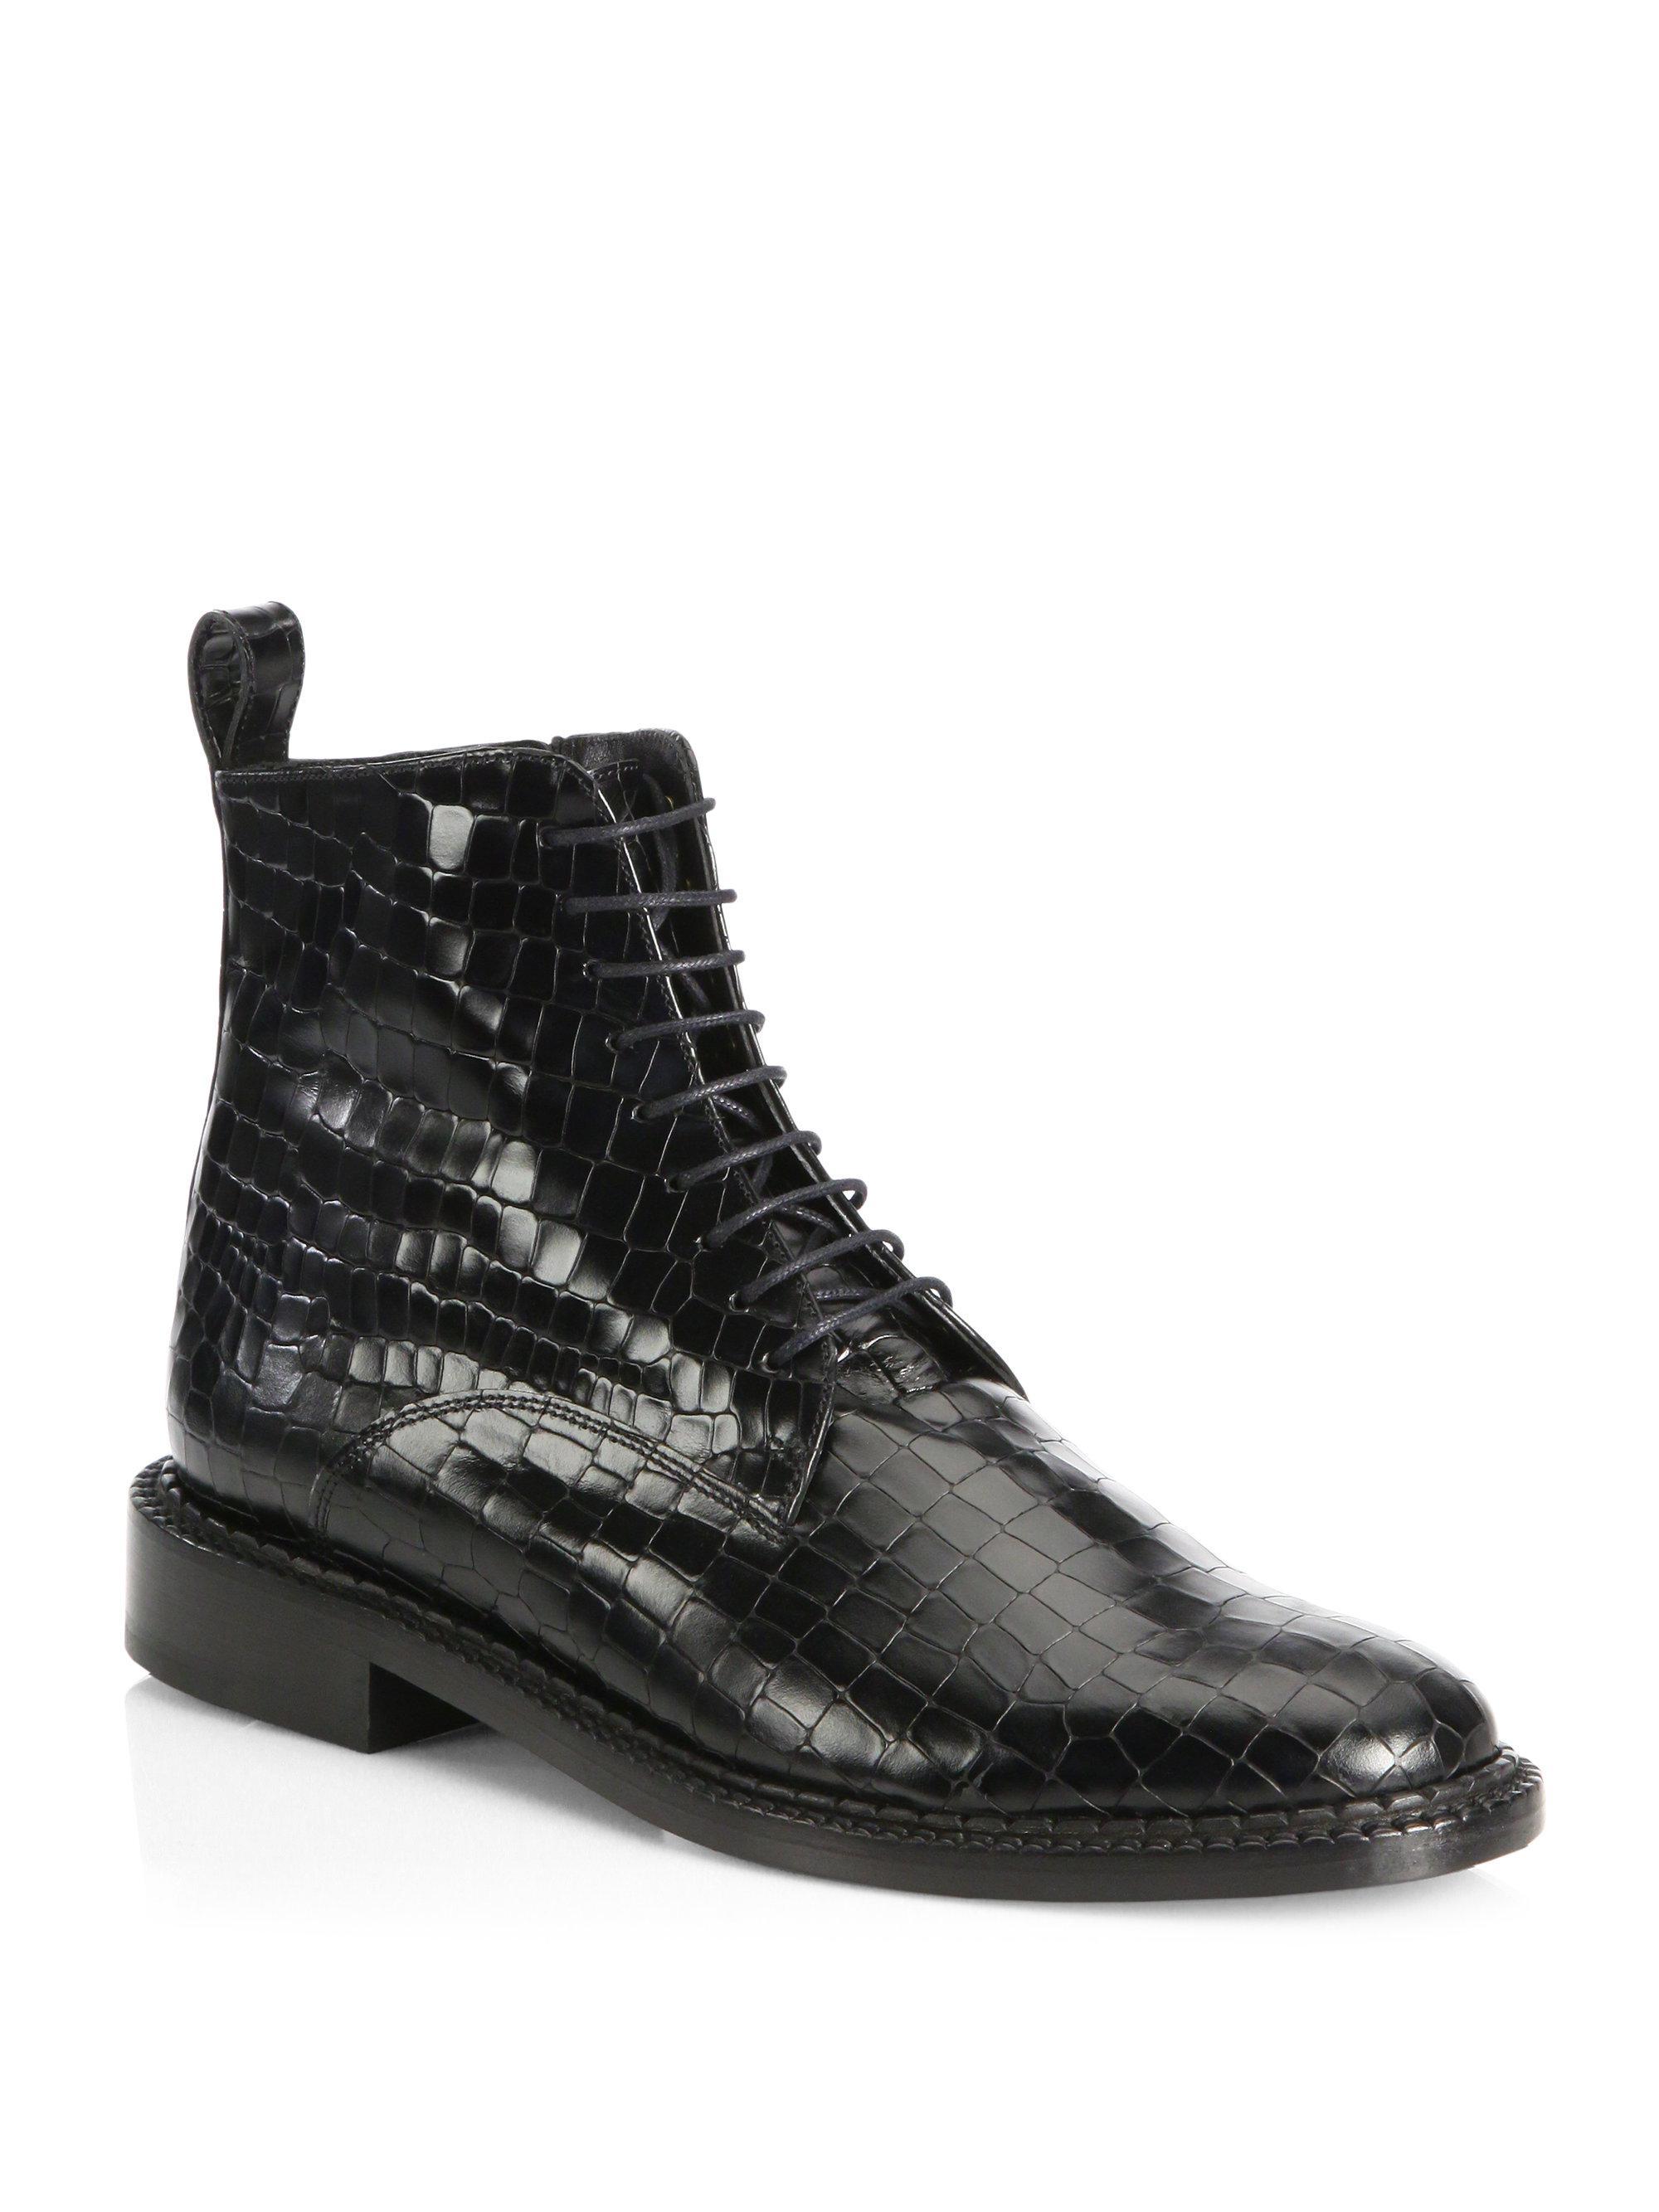 b356f7c6acae7 Robert Clergerie Jacen Leather Combat Boots in Black - Lyst